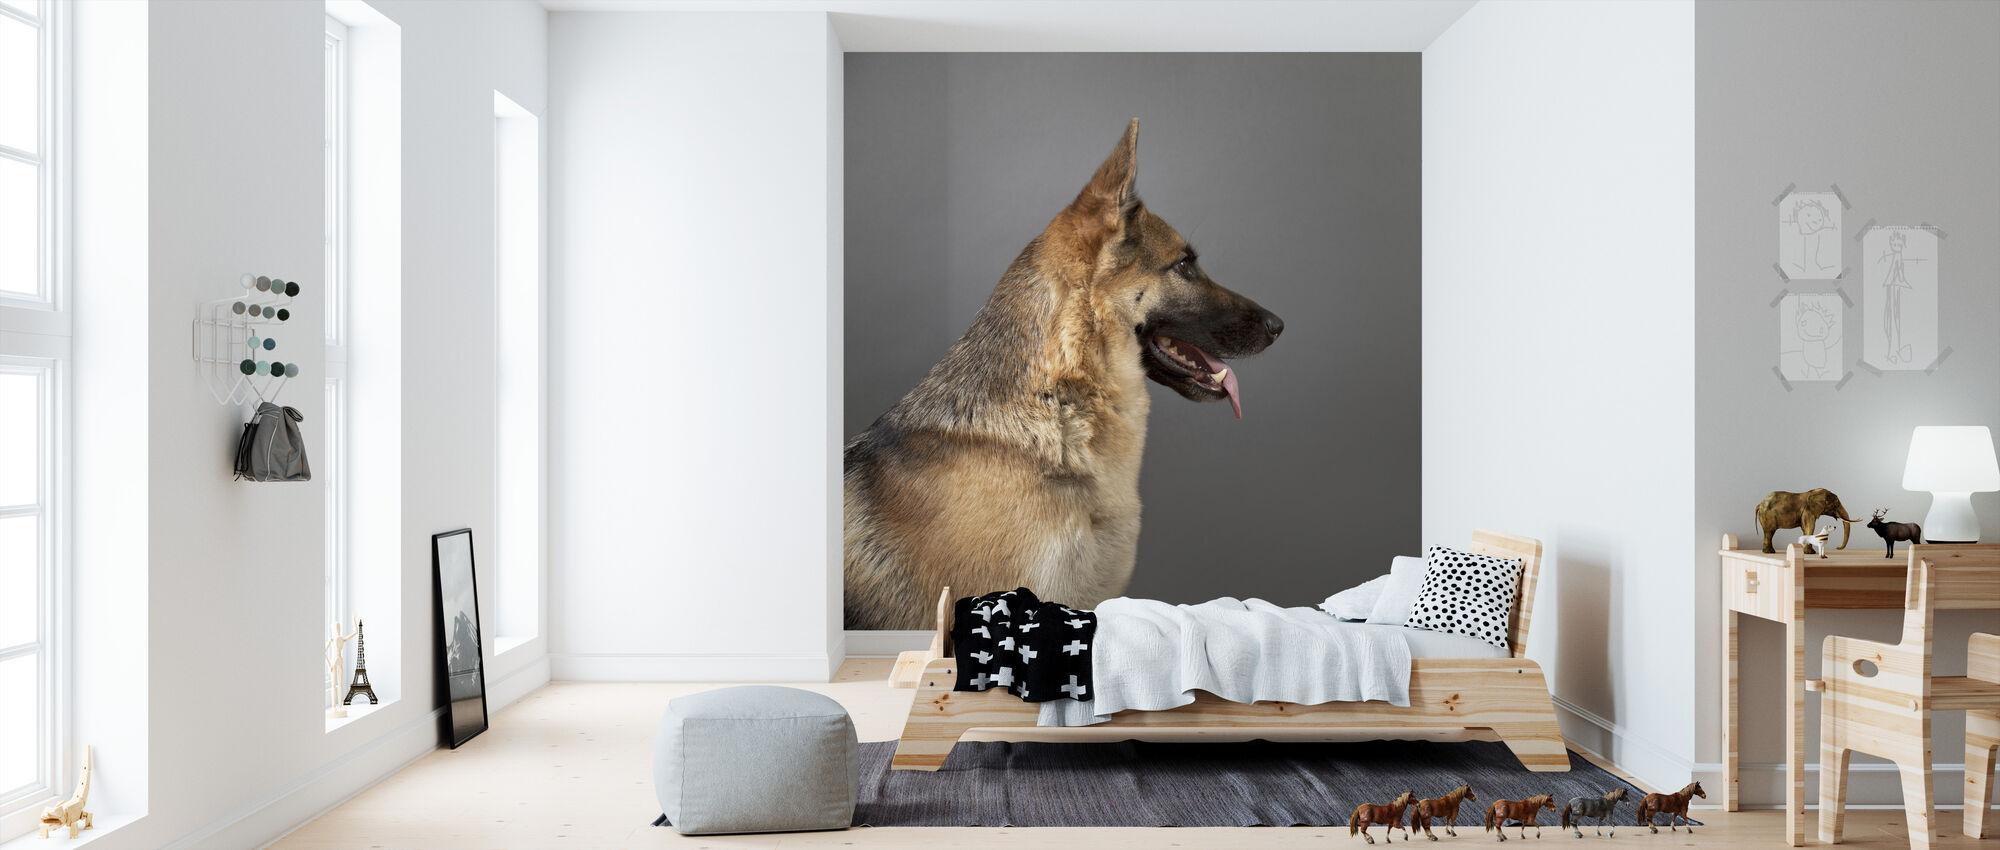 german shepherd fototapete nach ma photowall. Black Bedroom Furniture Sets. Home Design Ideas